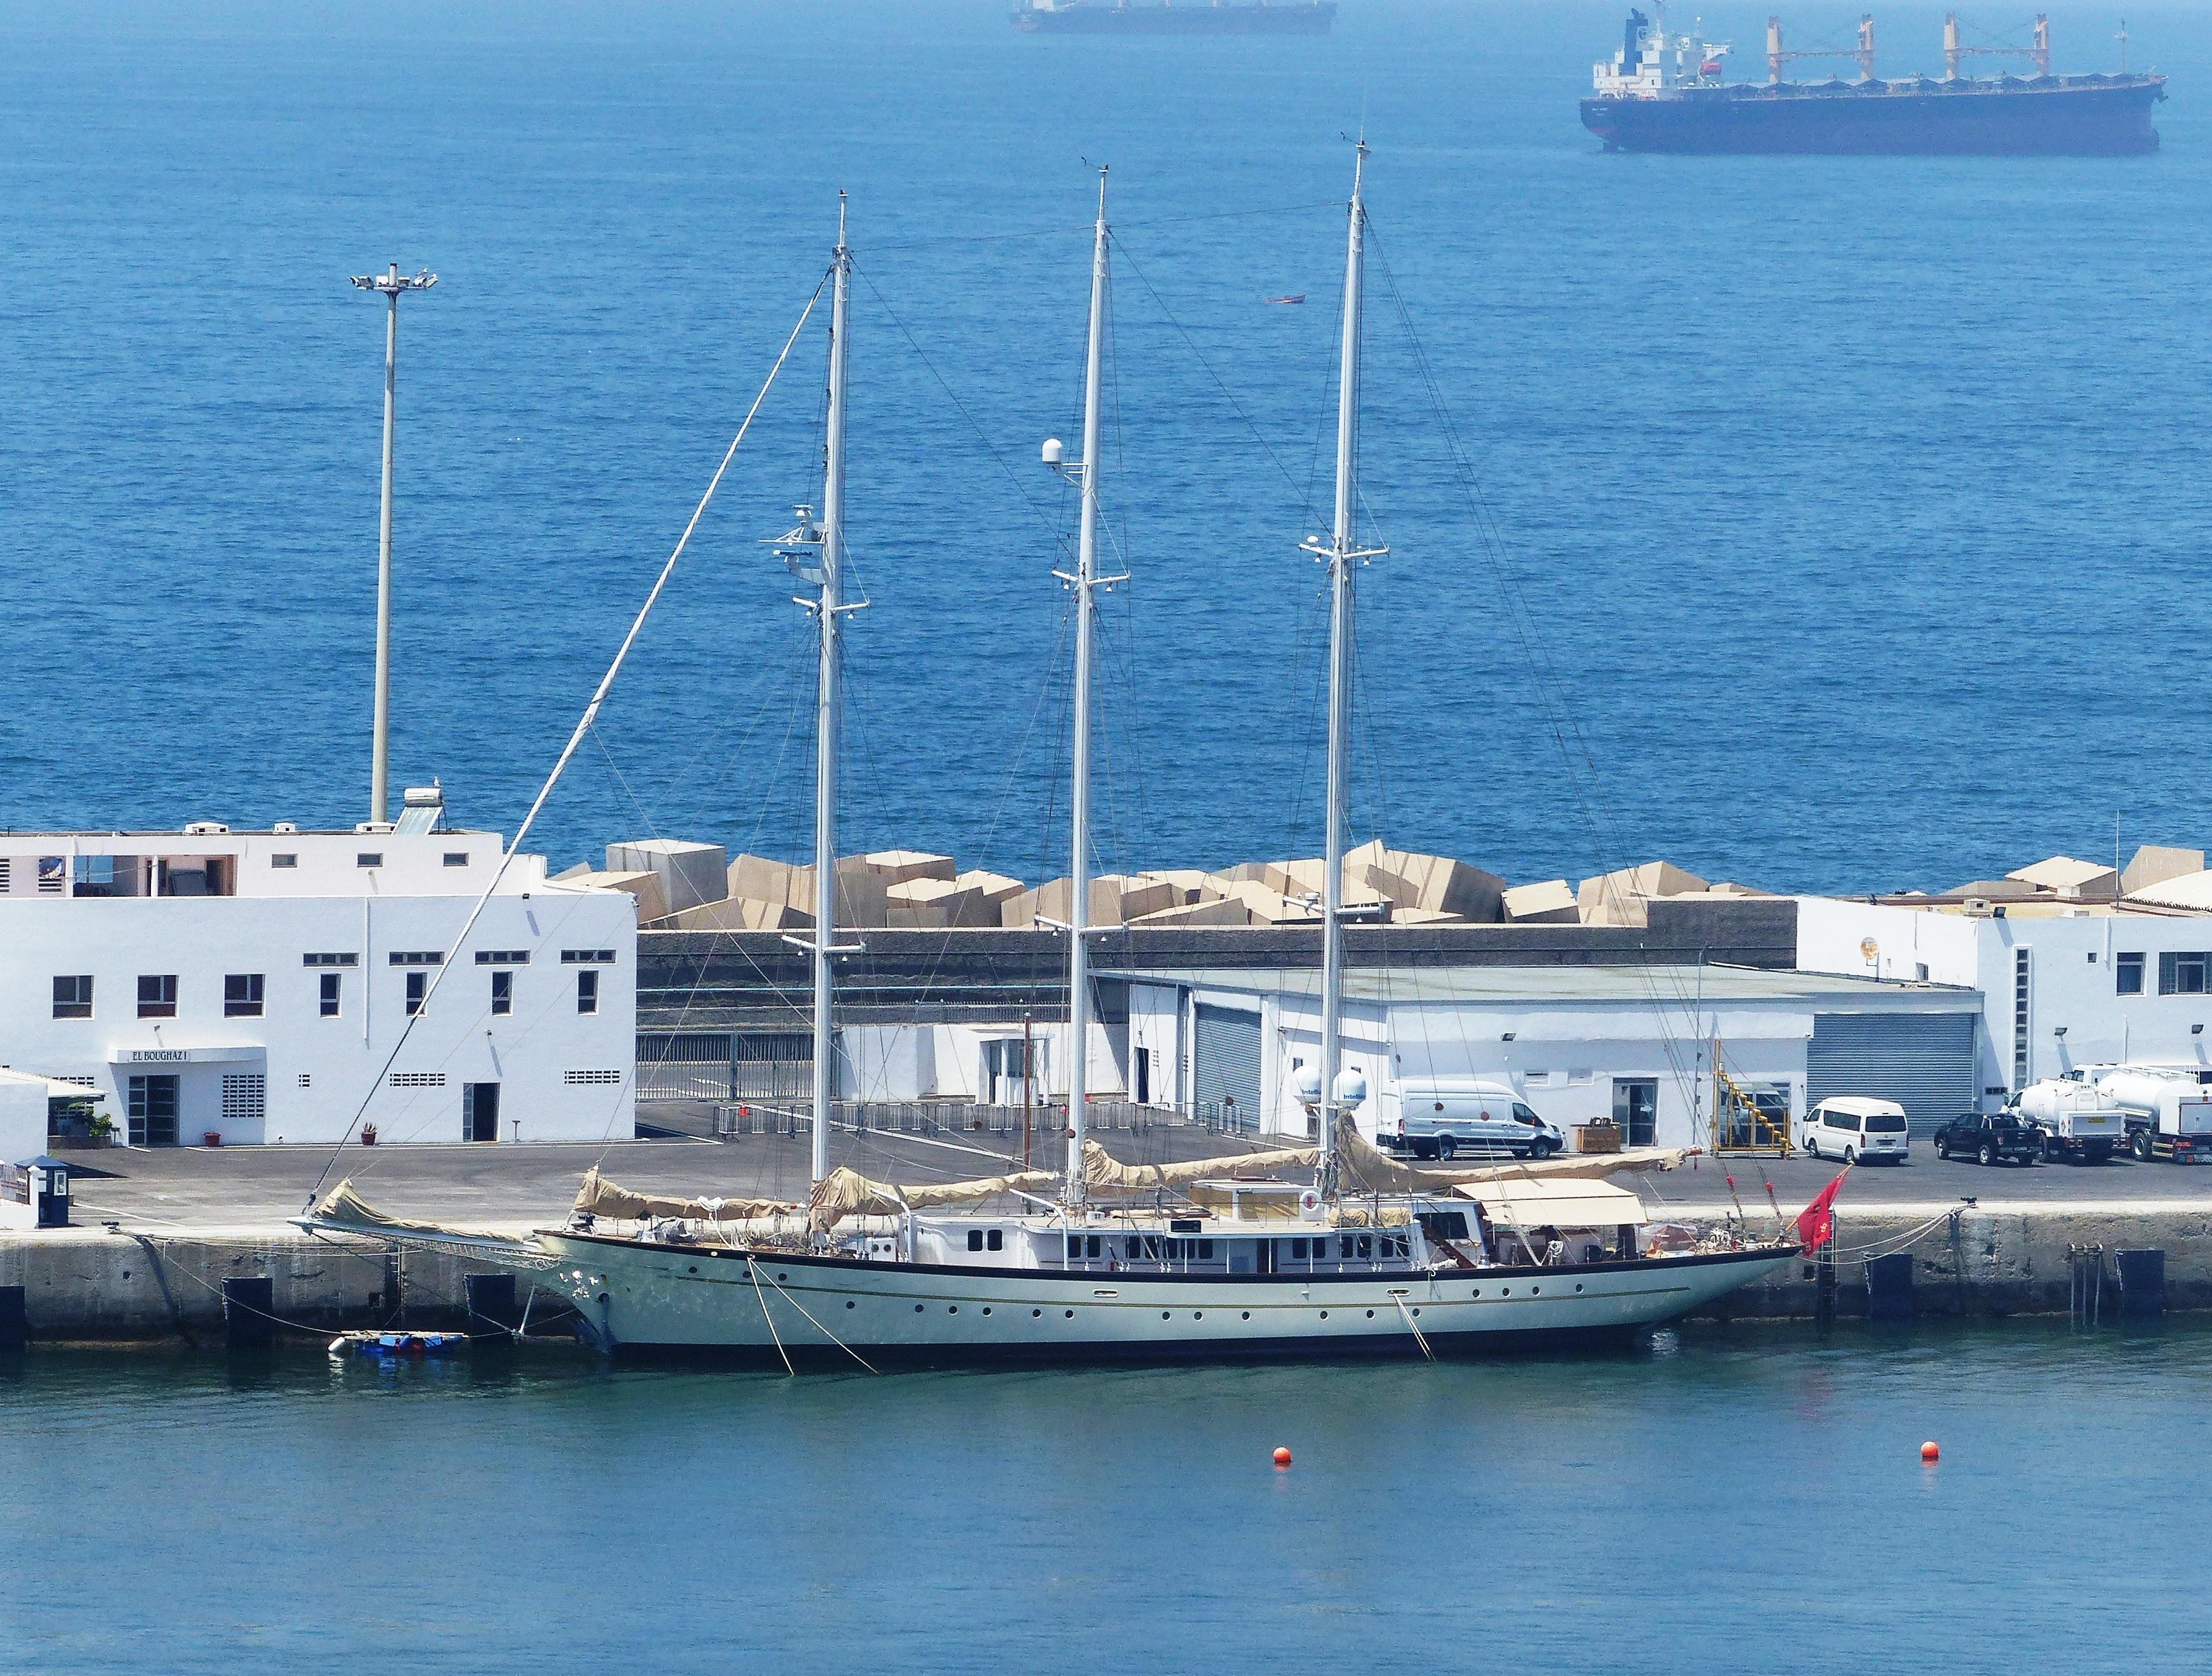 la flotte des Yachts Royals : El Boughaz I - Badis 1 - Page 2 3038088